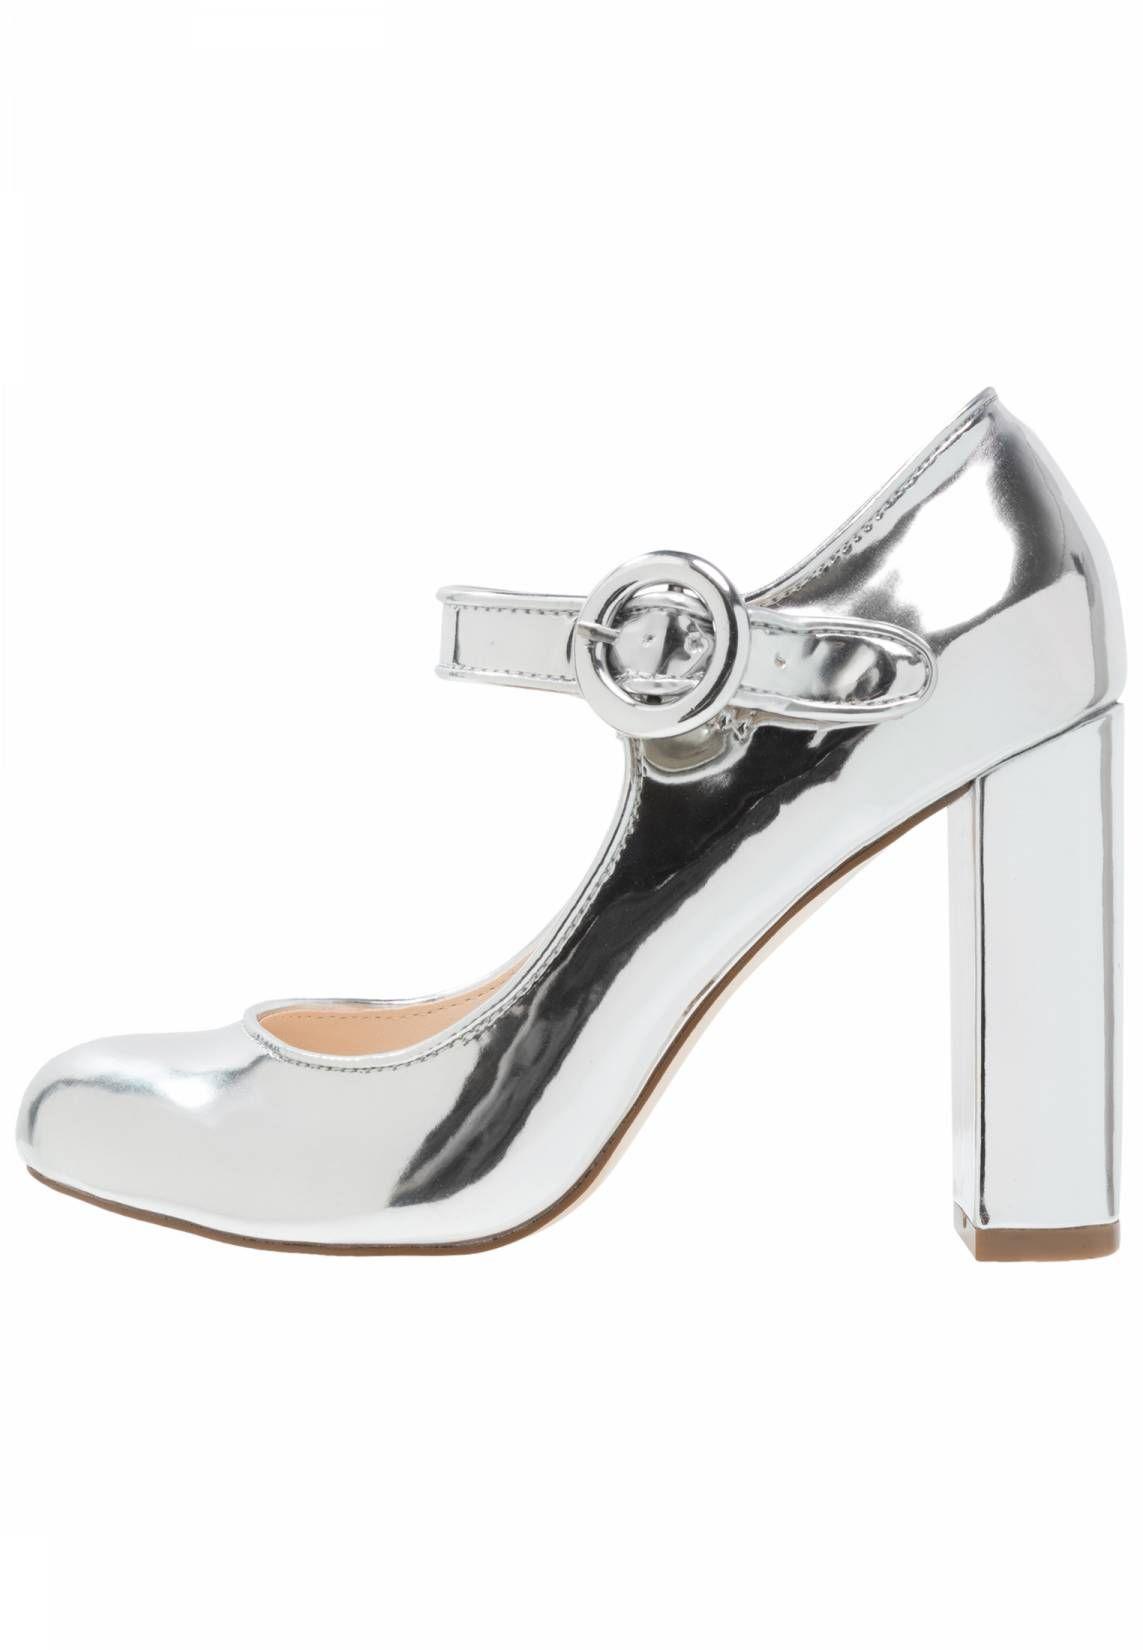 Even&Odd High heeled sandals - gunmetal TTSj0